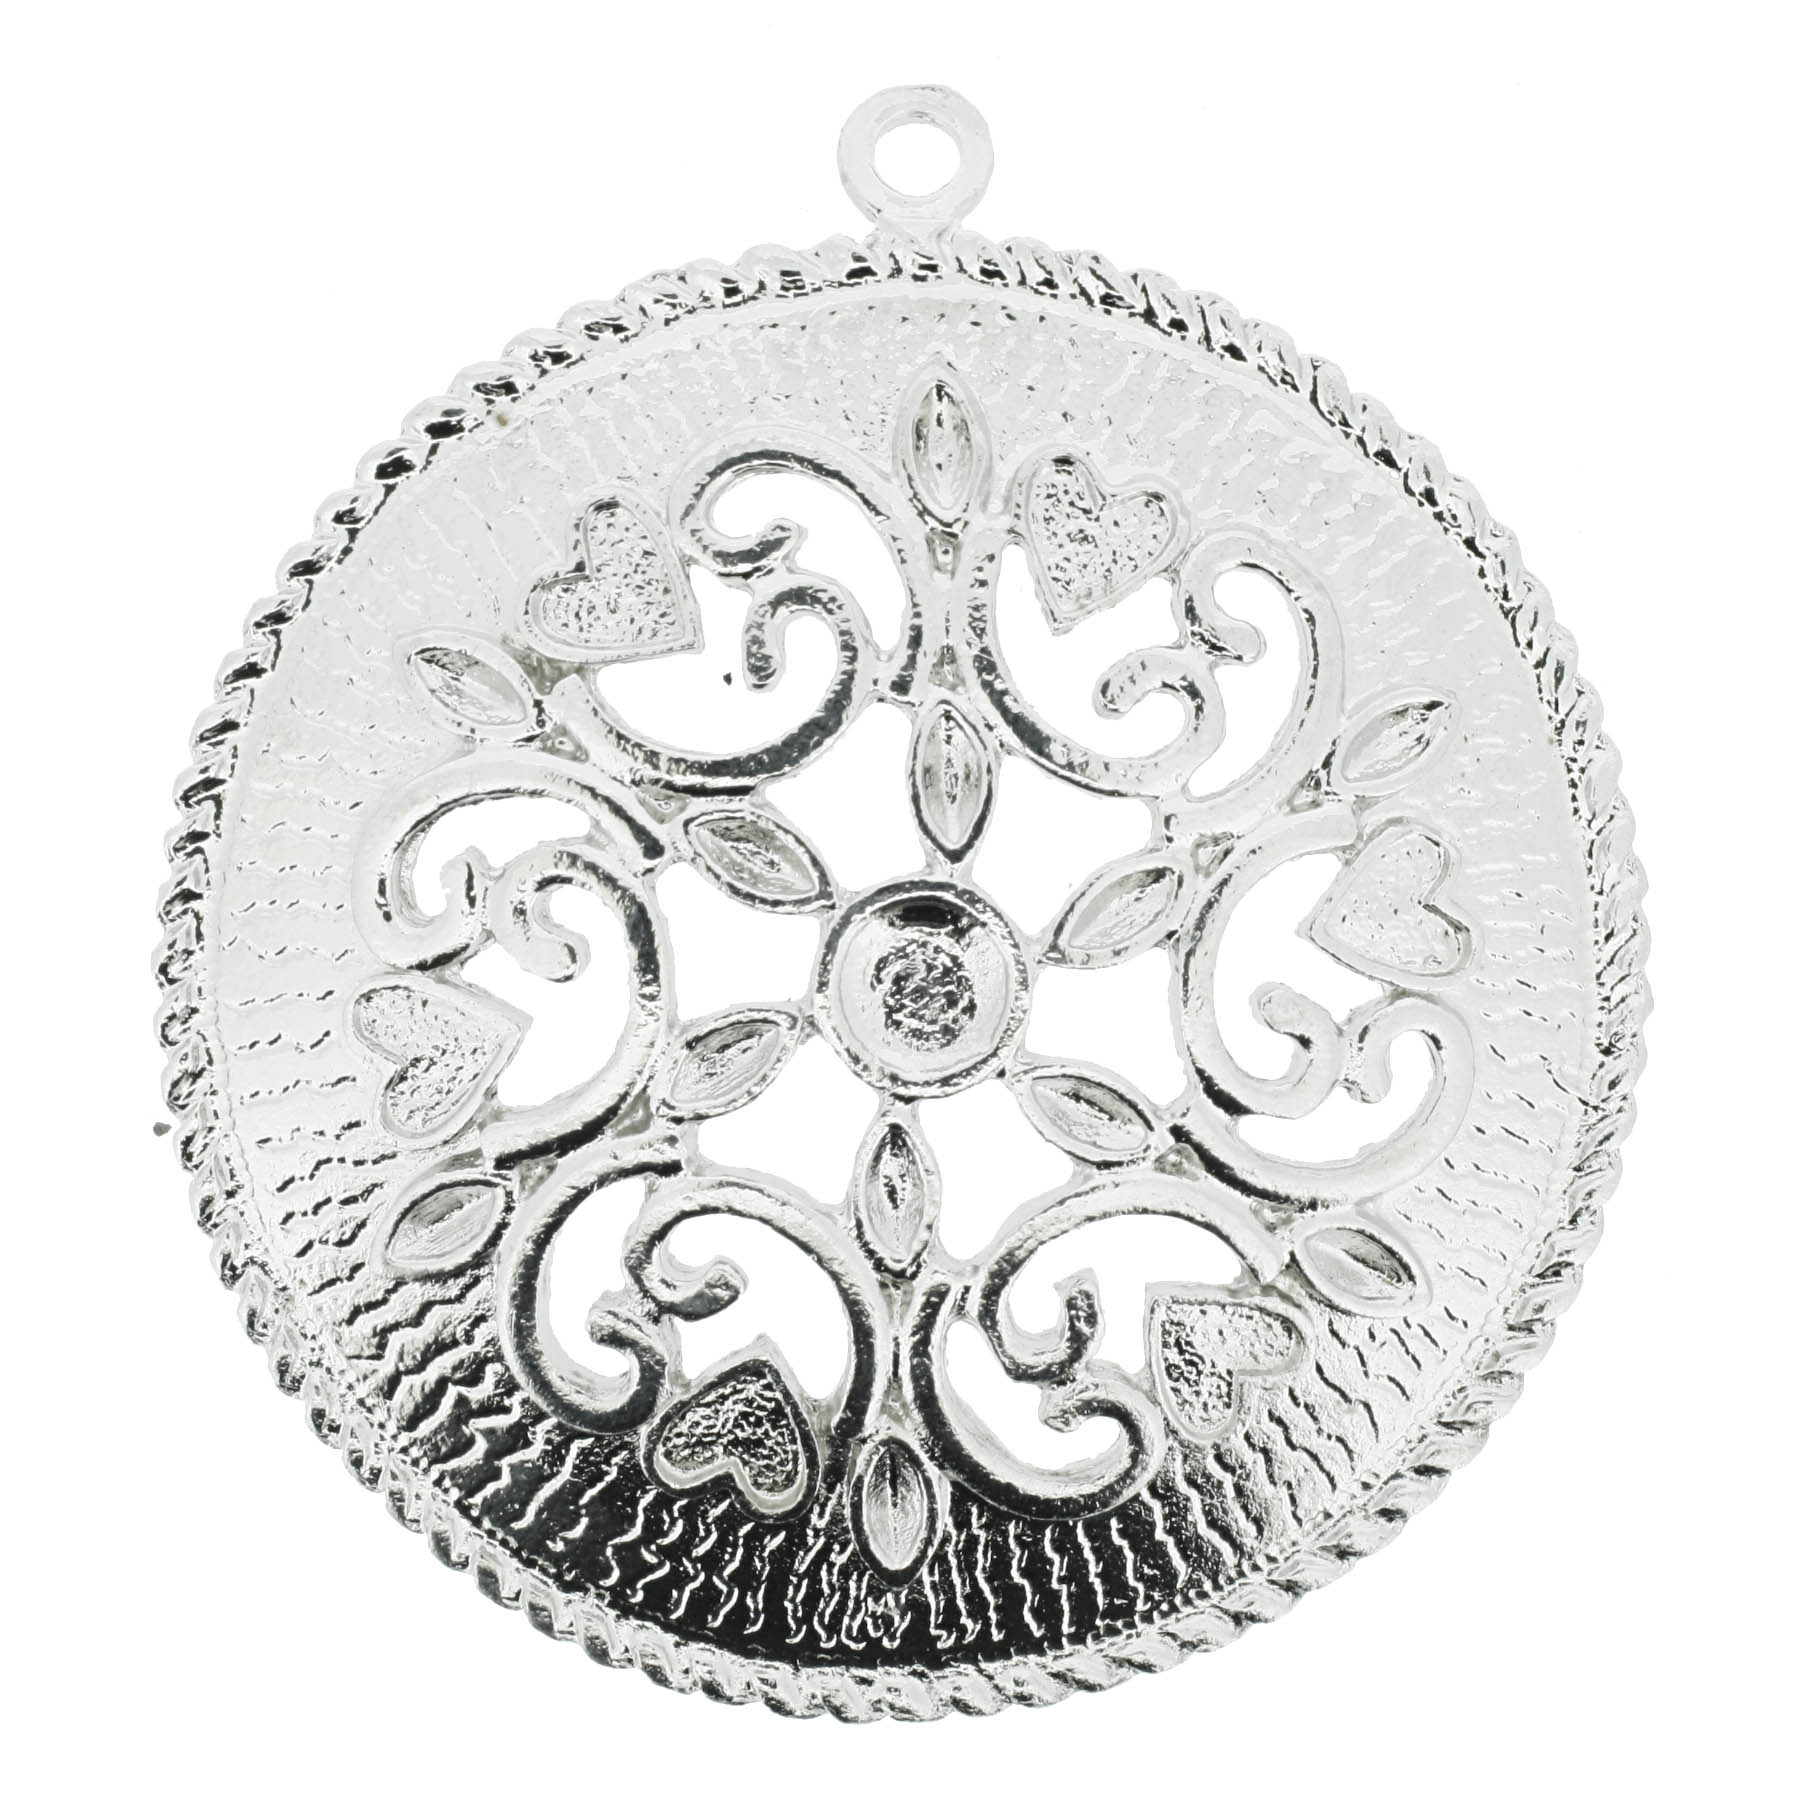 Mandala Floral - Níquel - 75mm  - Stéphanie Bijoux® - Peças para Bijuterias e Artesanato